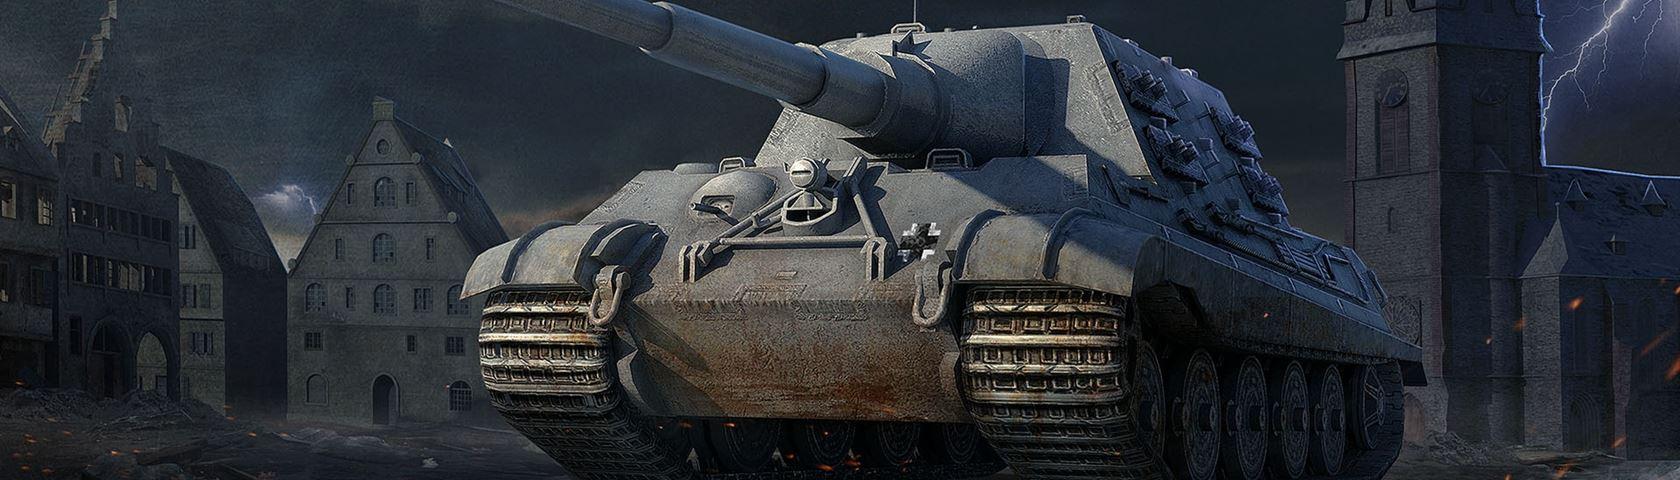 World of Tanks: Jagdtiger